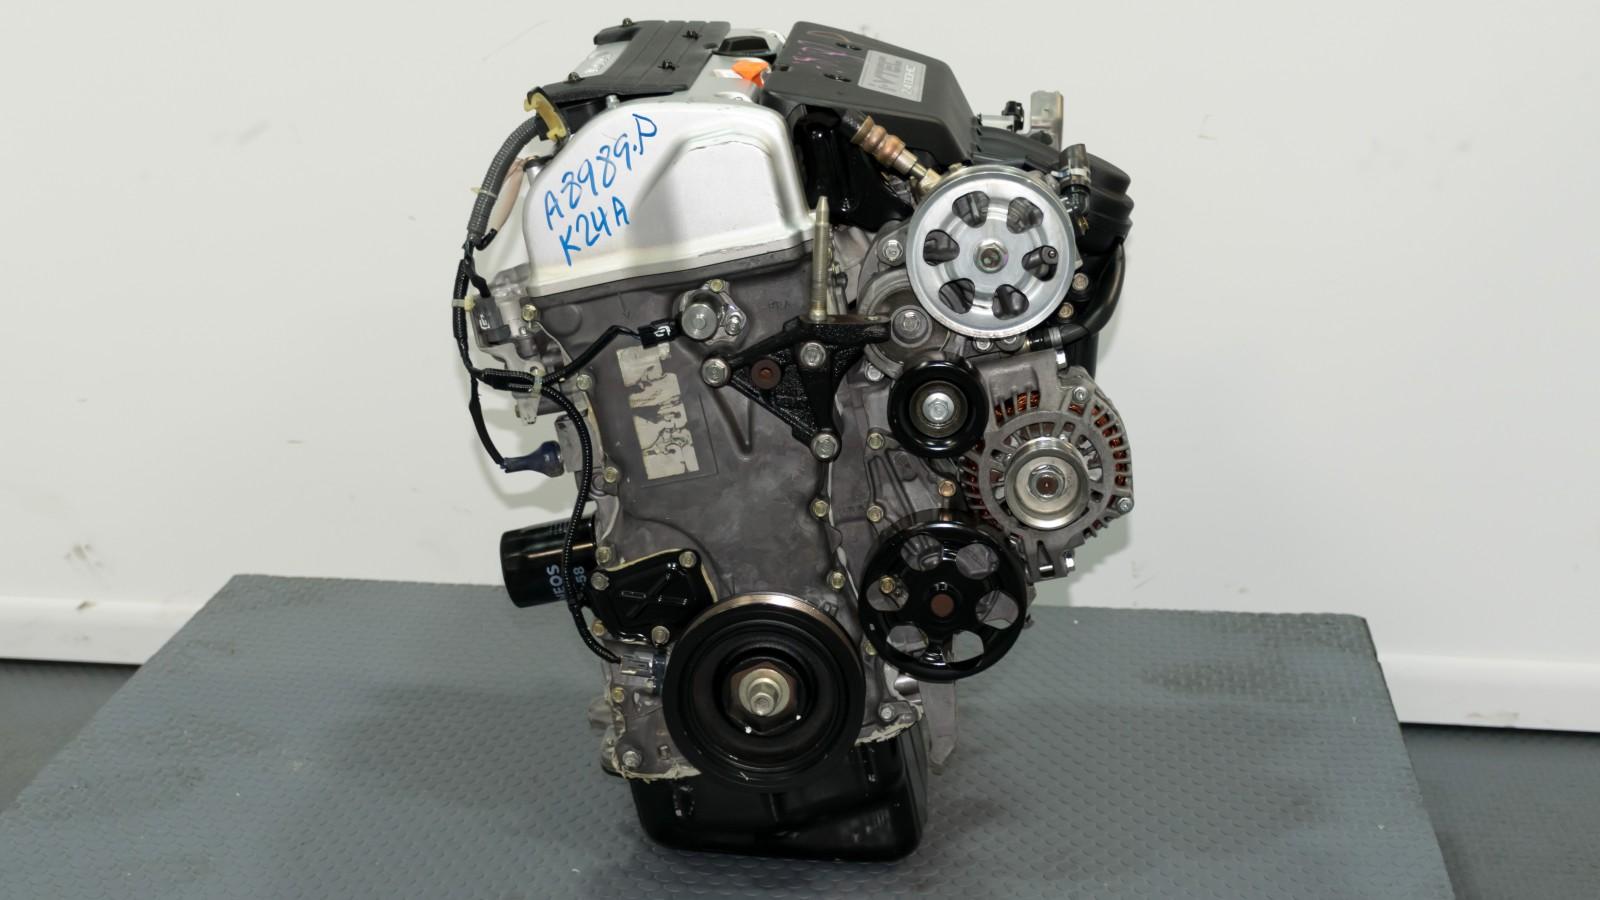 engine honda crv accord 2004 2003 vtec 2005 2006 2002 element 4l dohc engines k24a tsx spec sports auto dsc